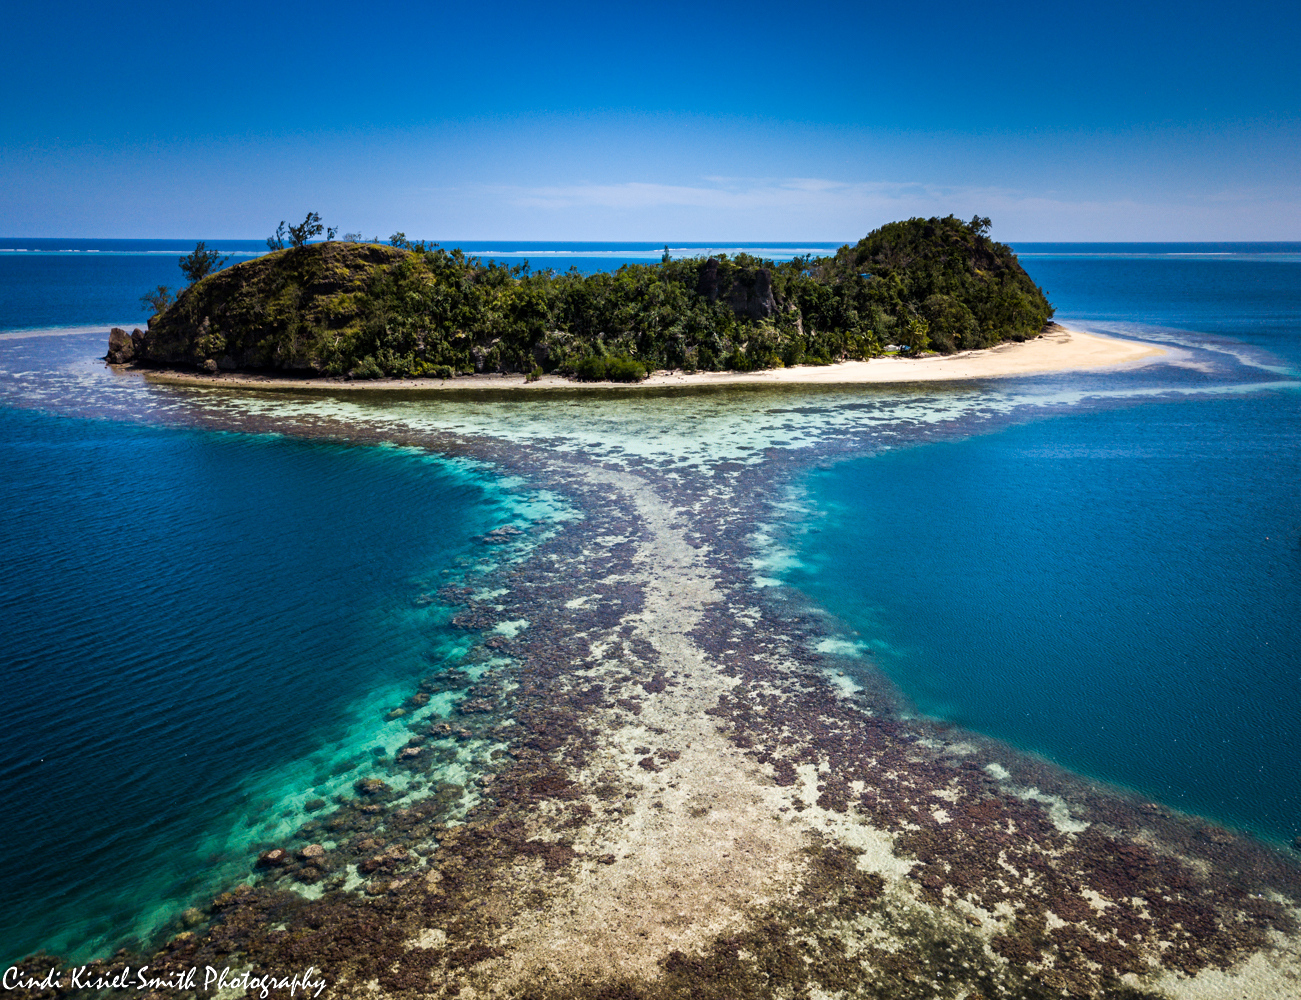 Matava Resort Lagoon, Fiji, Fiji